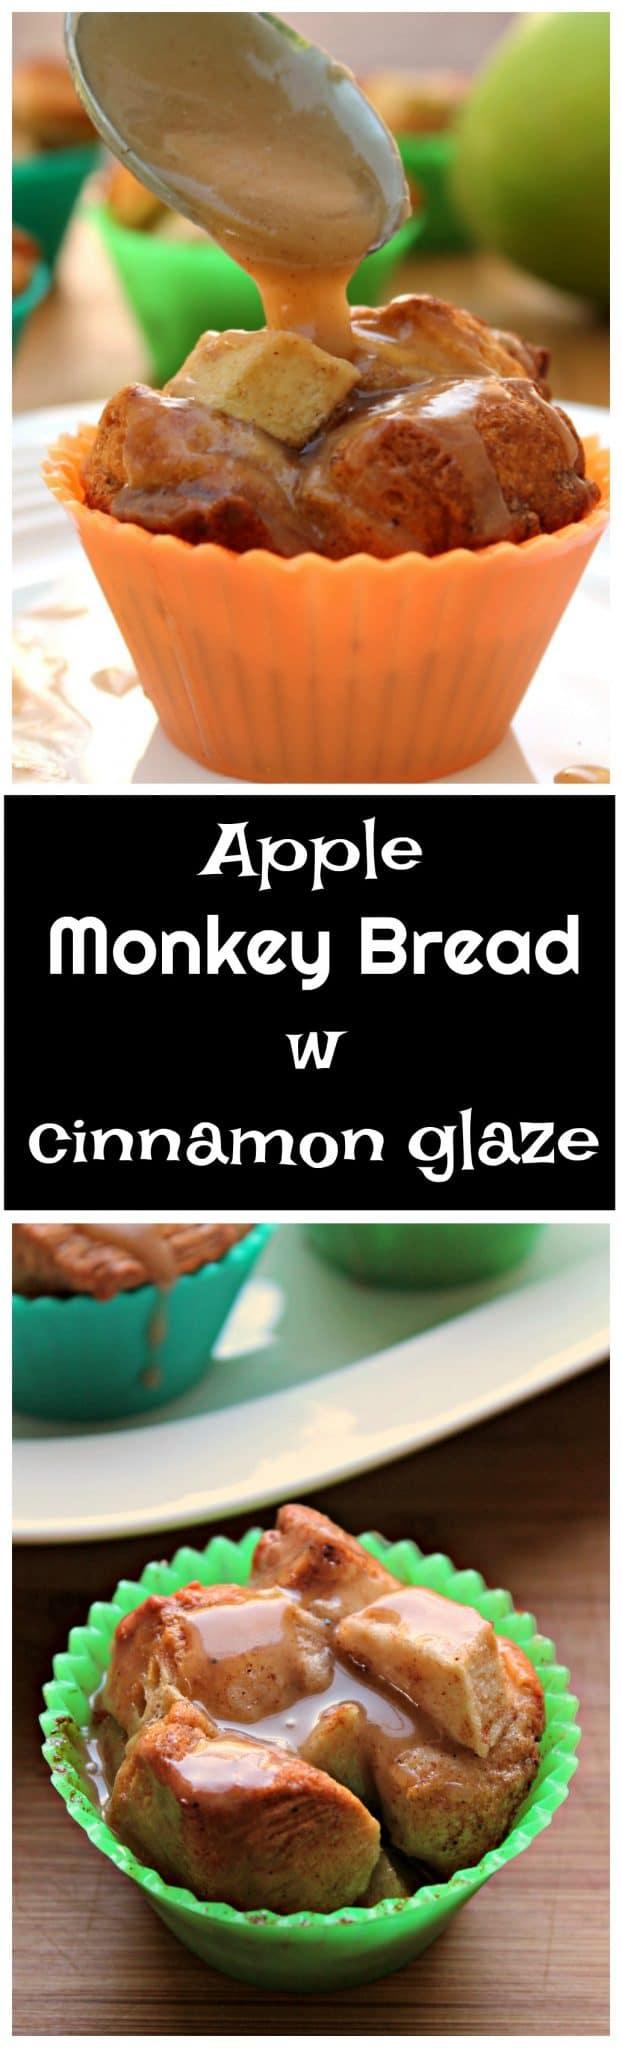 Individual Apple Monkey Bread w Cinnamon Glaze